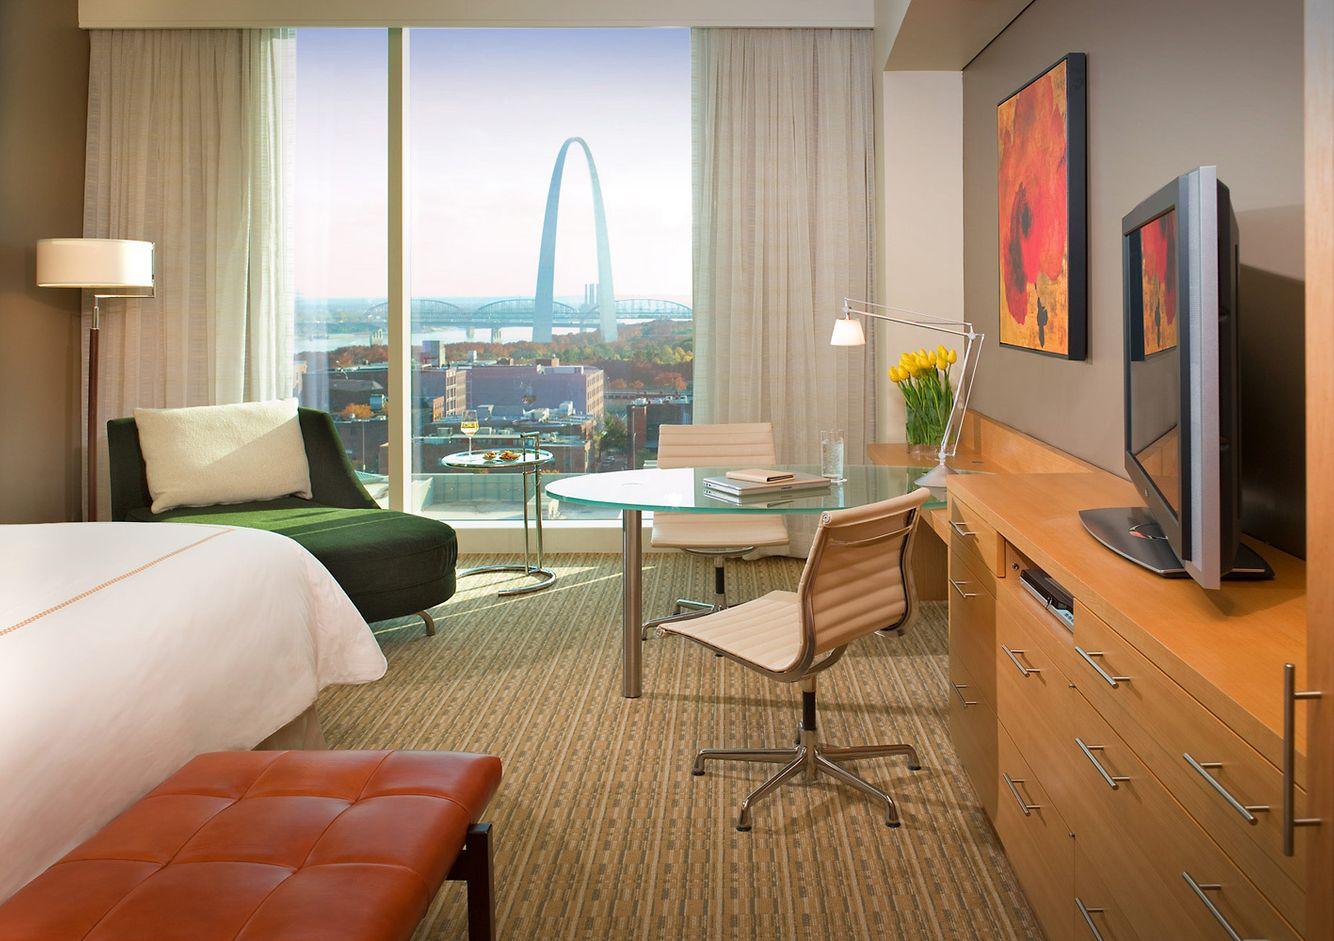 John-Sutton-Photography-Four Seasons Hotel St Louis Guestroom